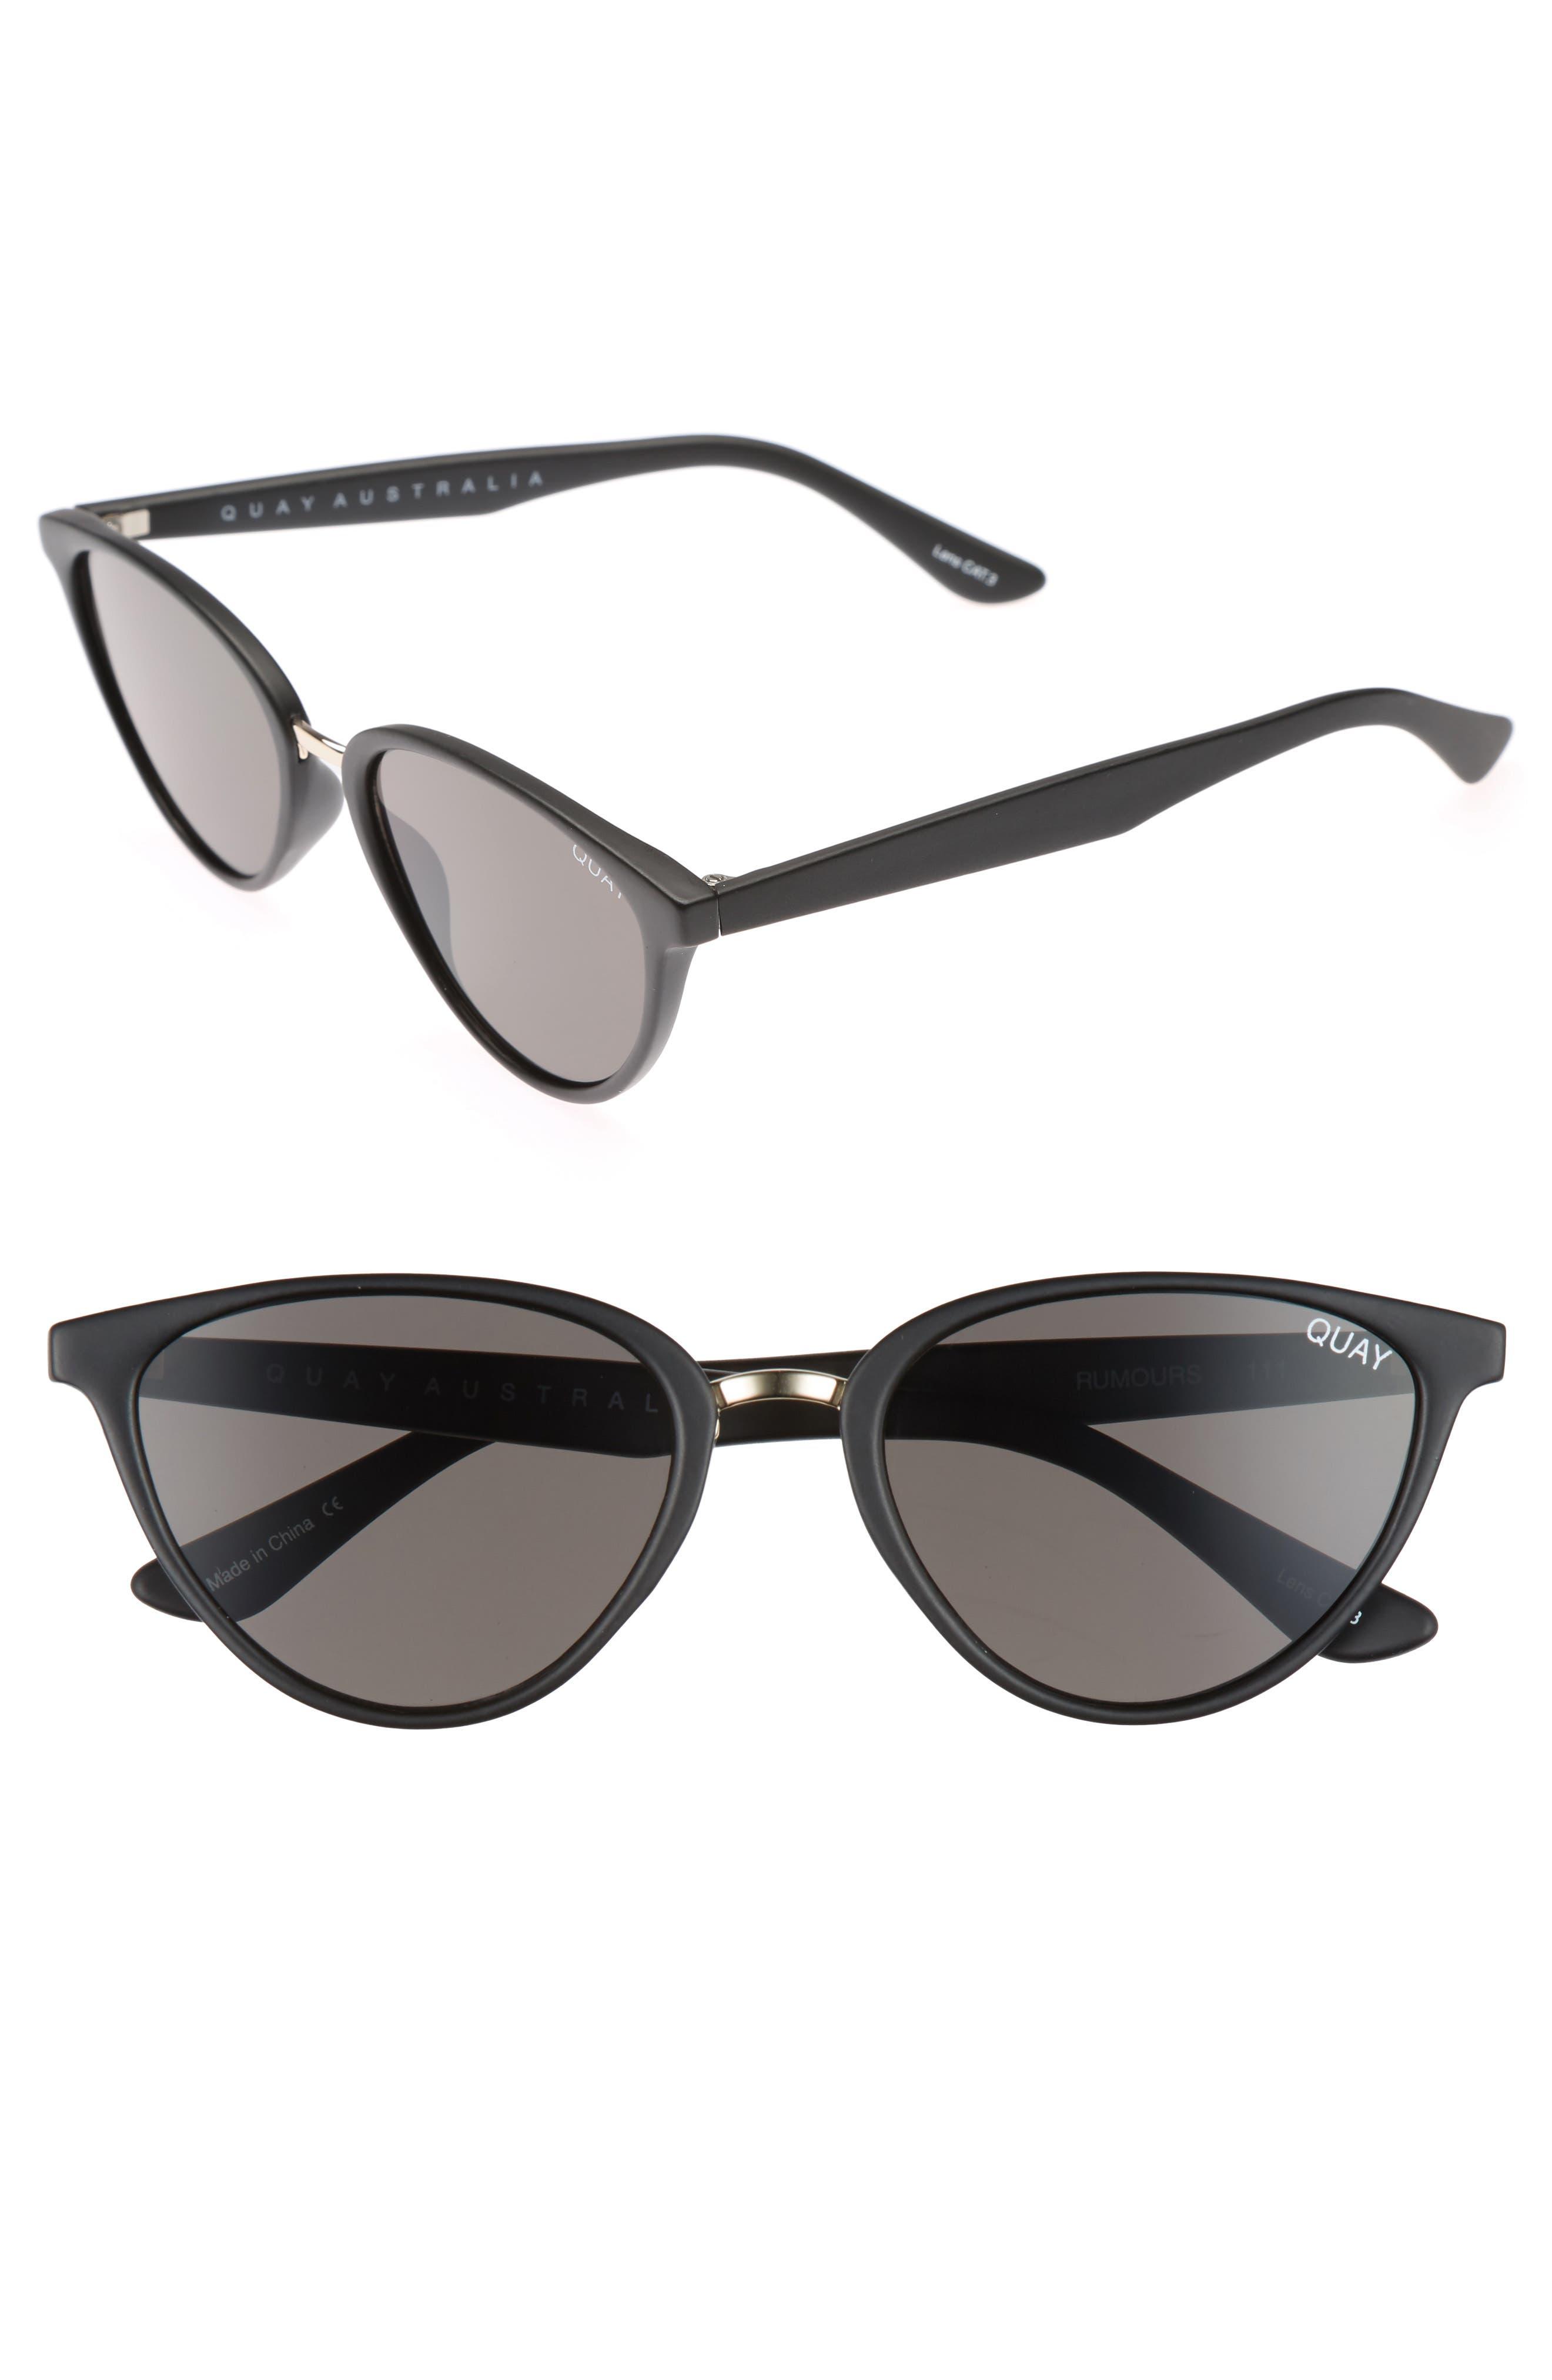 Quay Australia Rumors 57Mm Sunglasses - Black Smoke